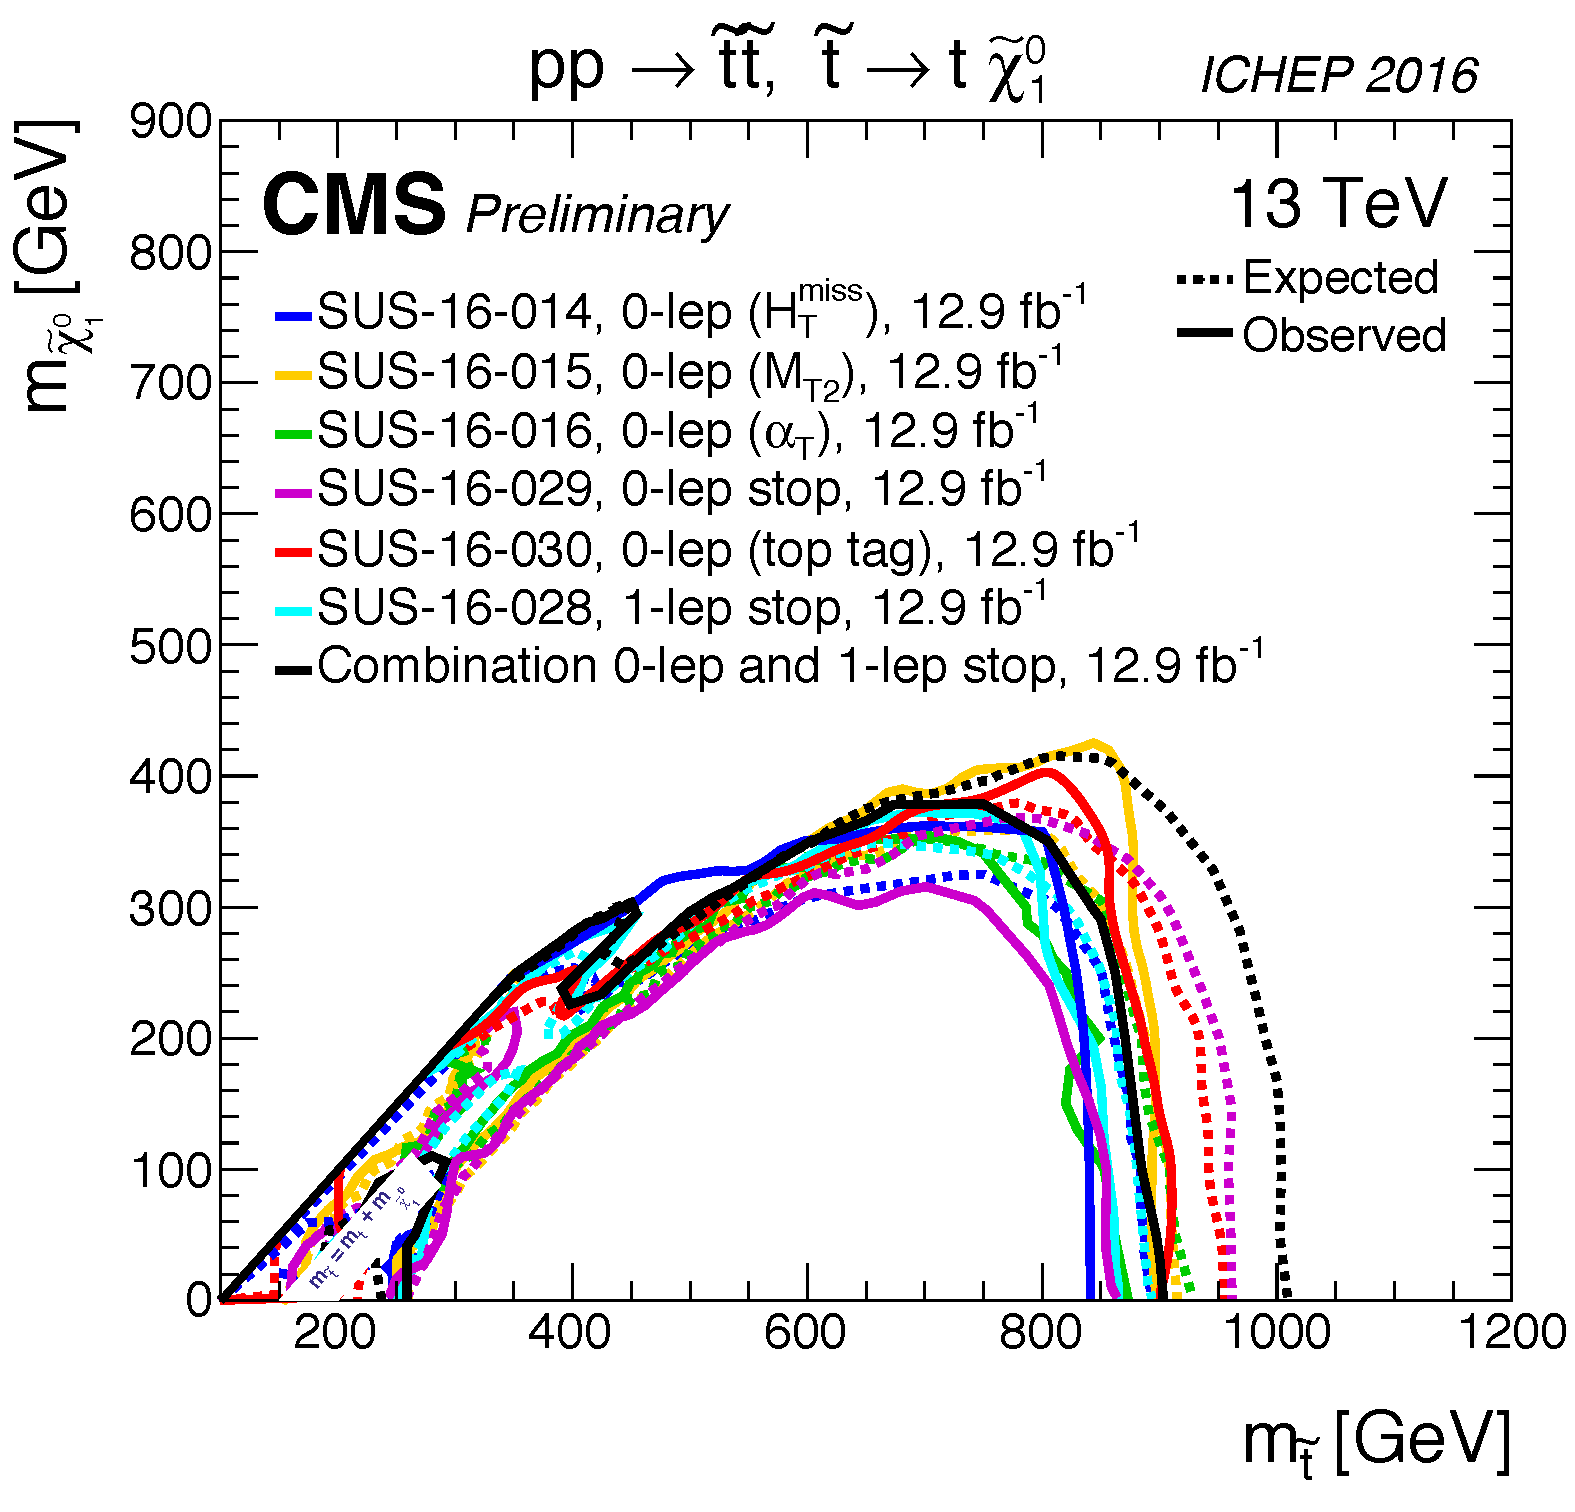 T2tt_limits_summary_cms_ICHEP16.png